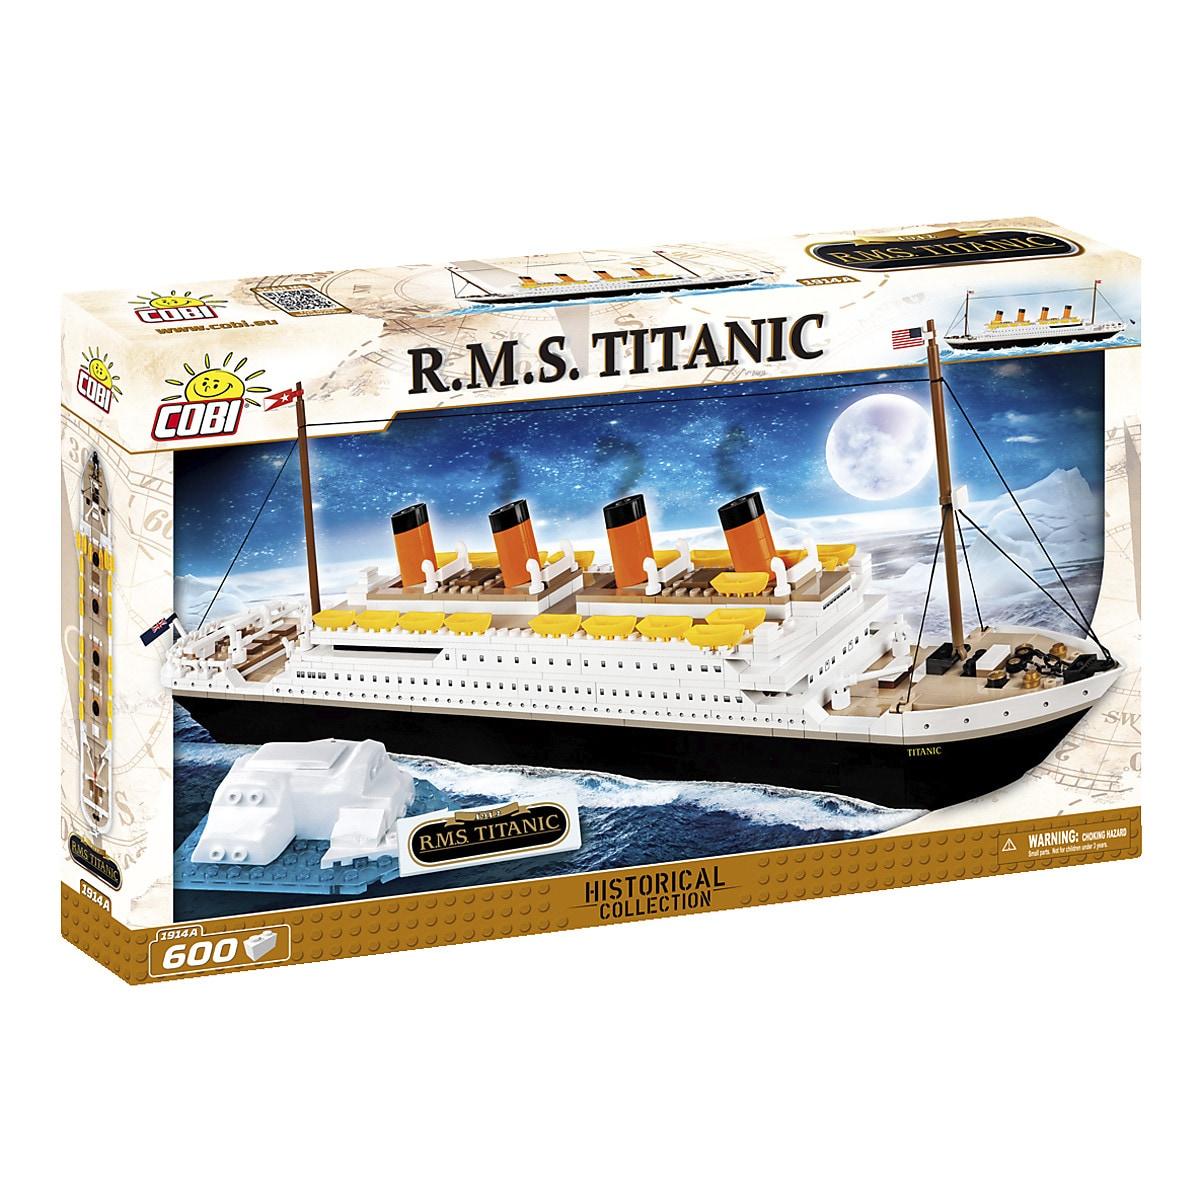 Byggklossar R.M.S. Titanic Cobi